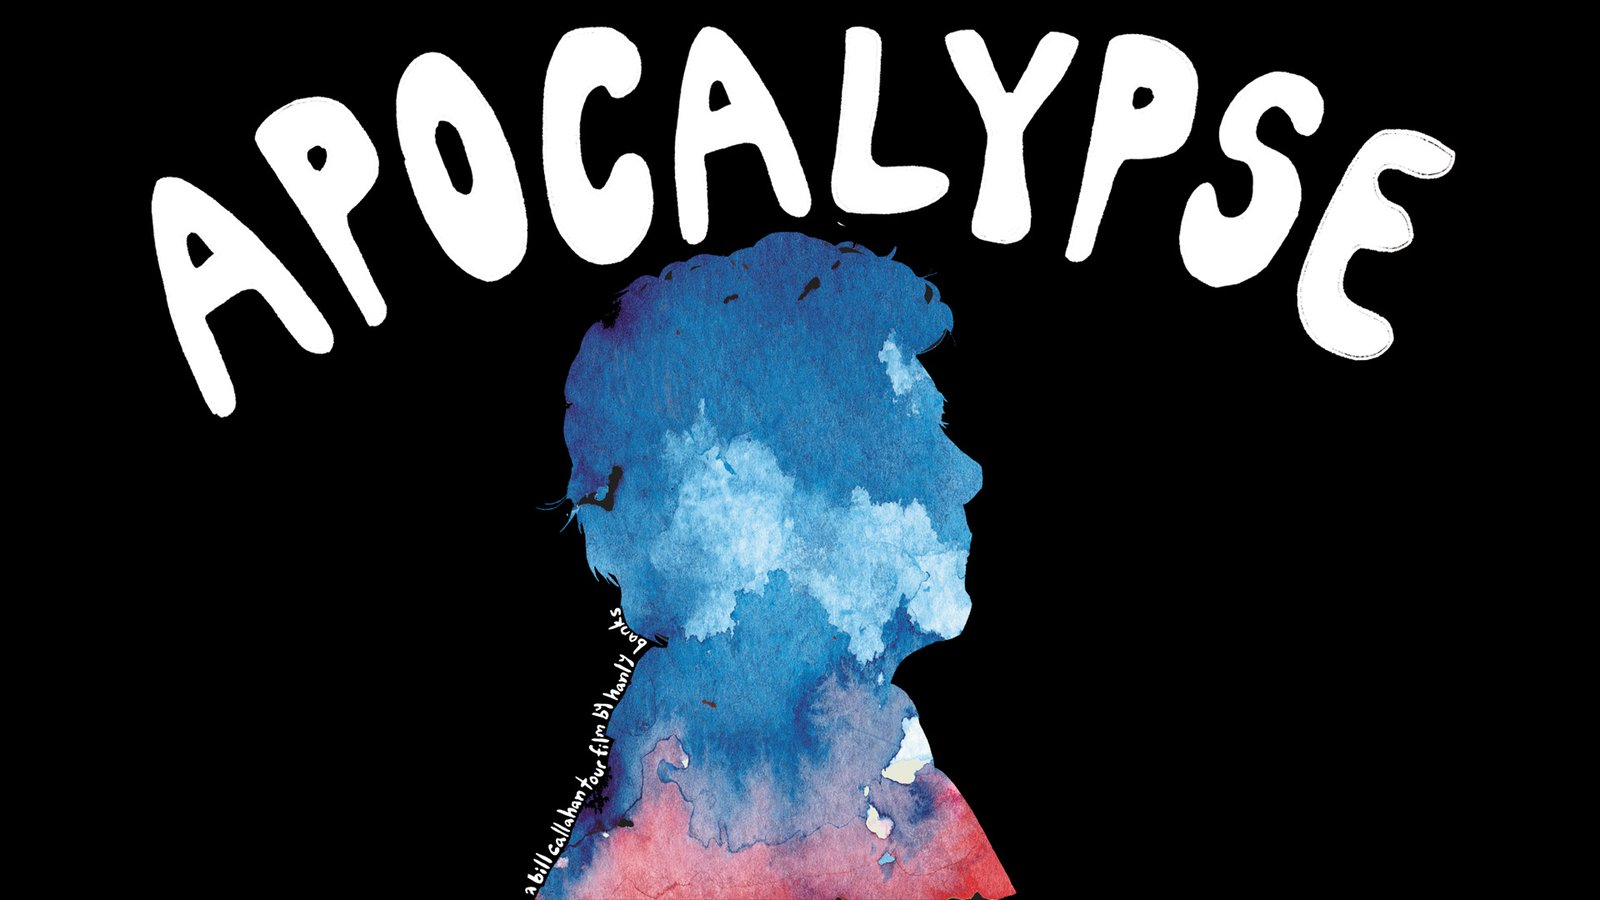 Apocalypse - A Concert Documentary Featuring Singer Bill Callahan